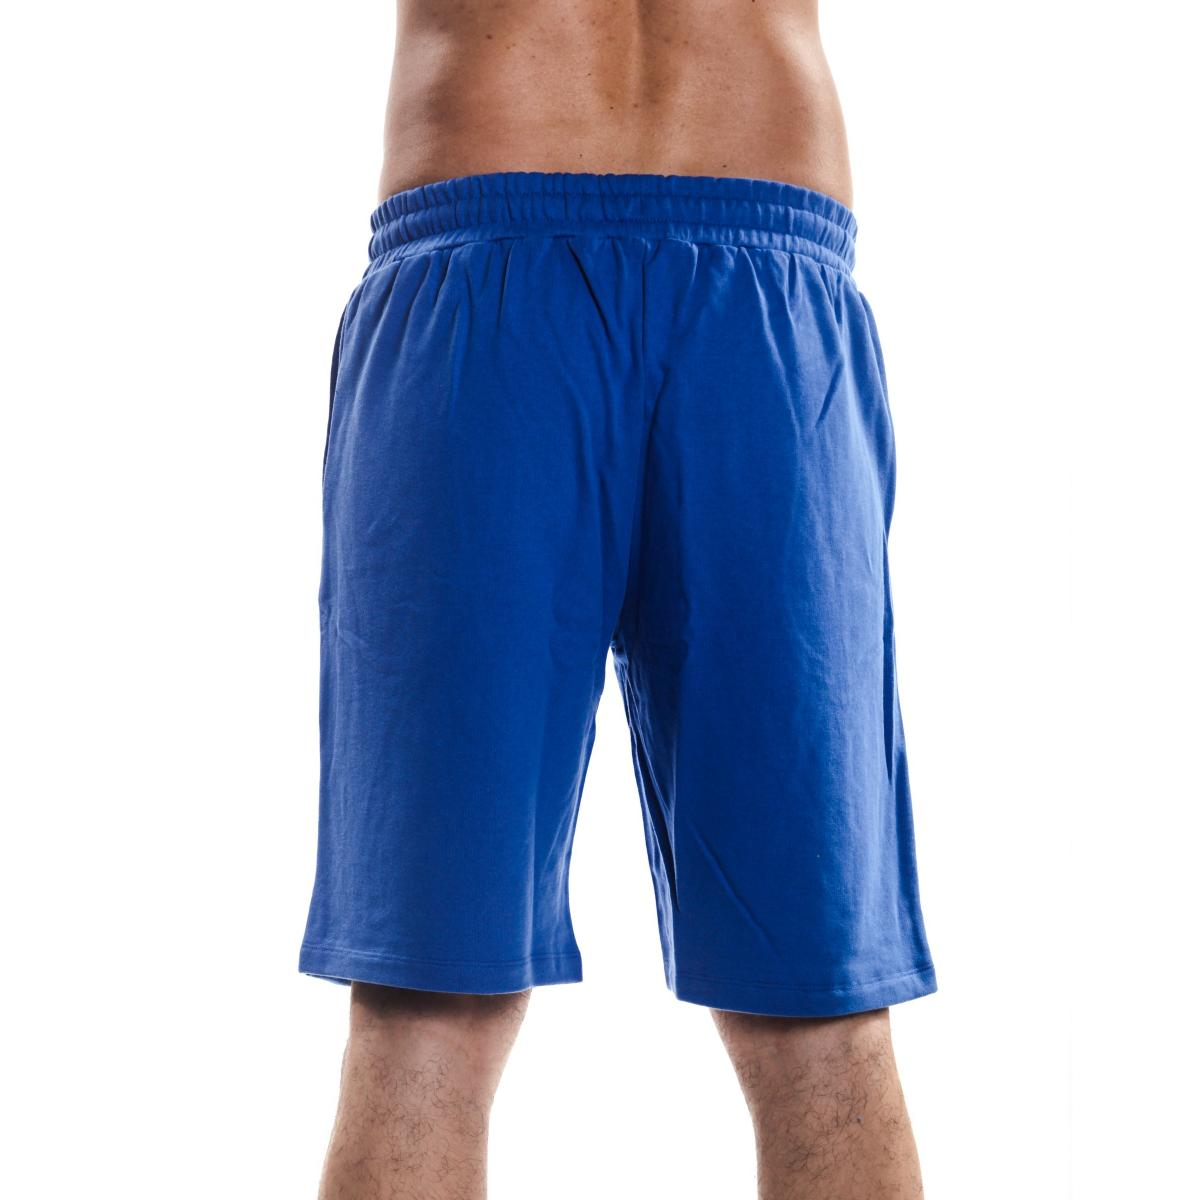 Bermuda shorts MINIMAL con stampa MNML since 2010 da uomo rif. U2083